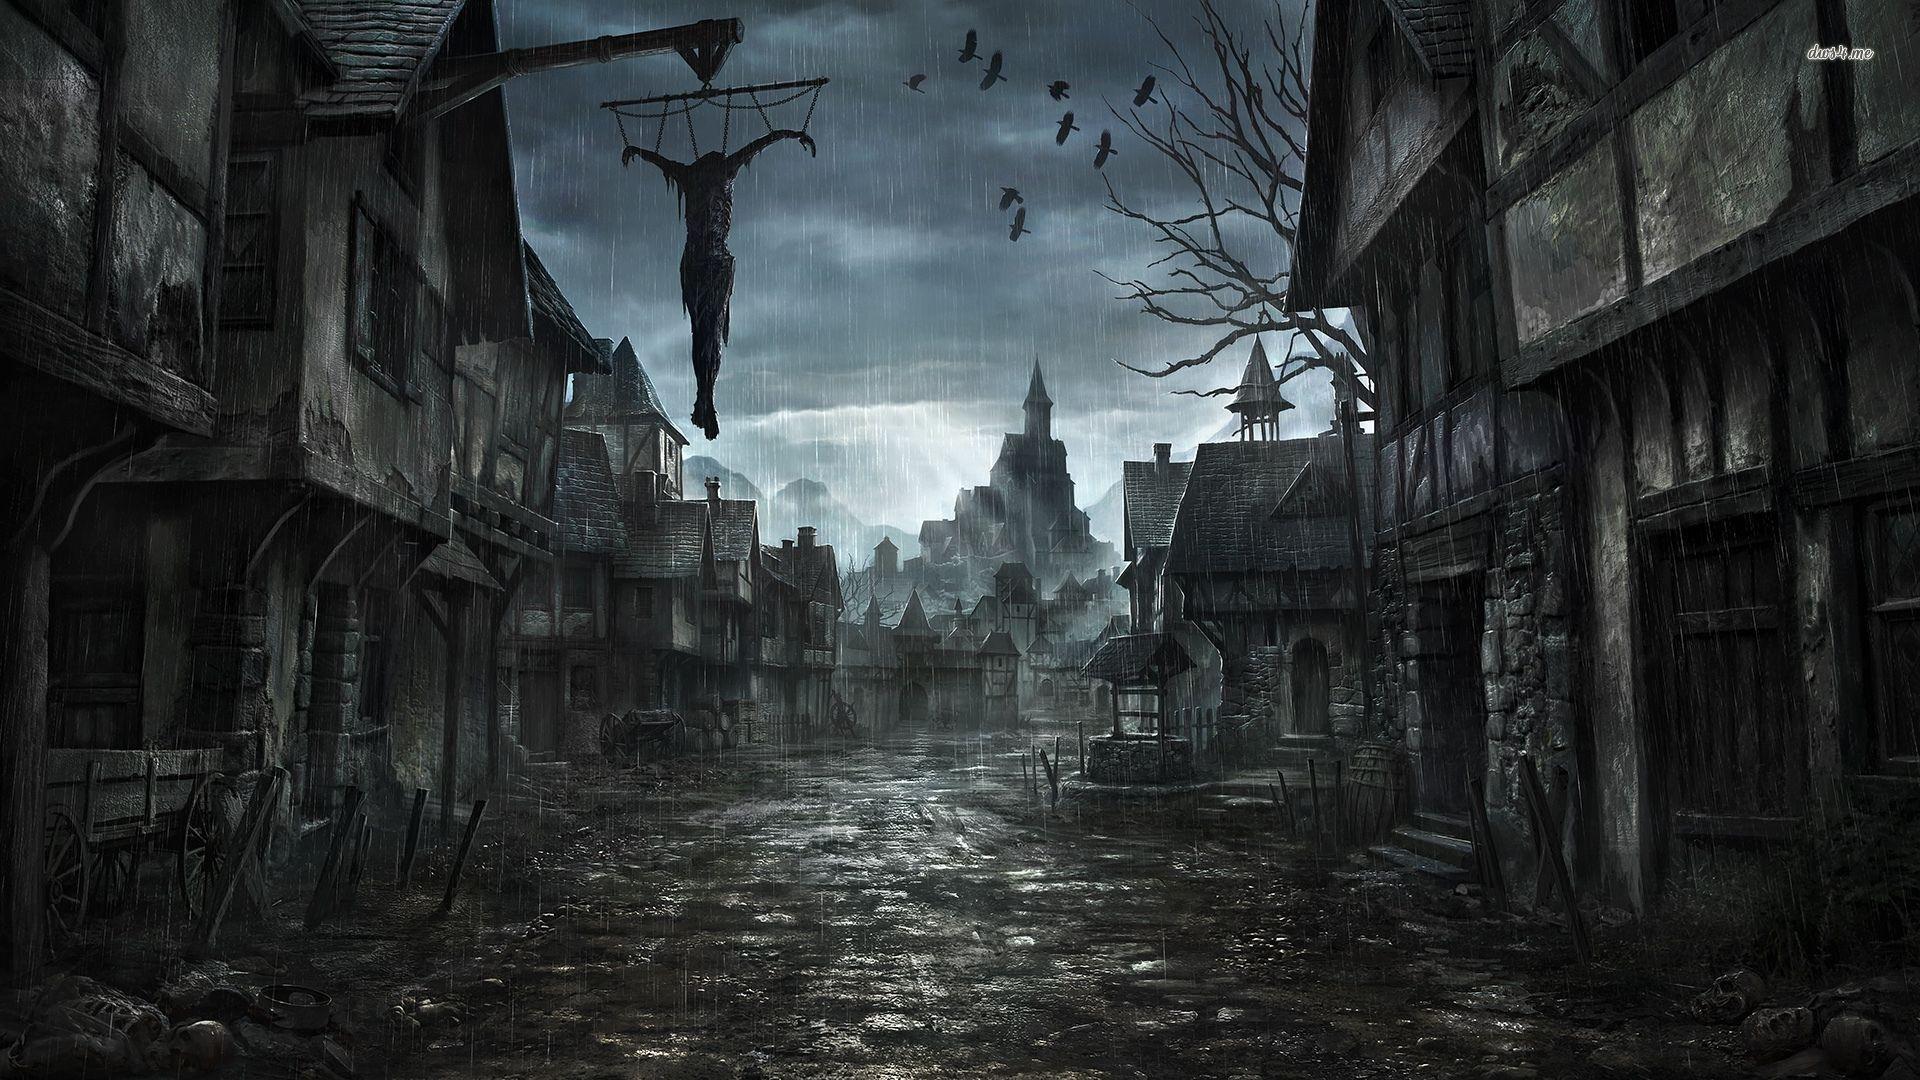 scary halloween wallpapers hd wallpaper | hd wallpapers | pinterest